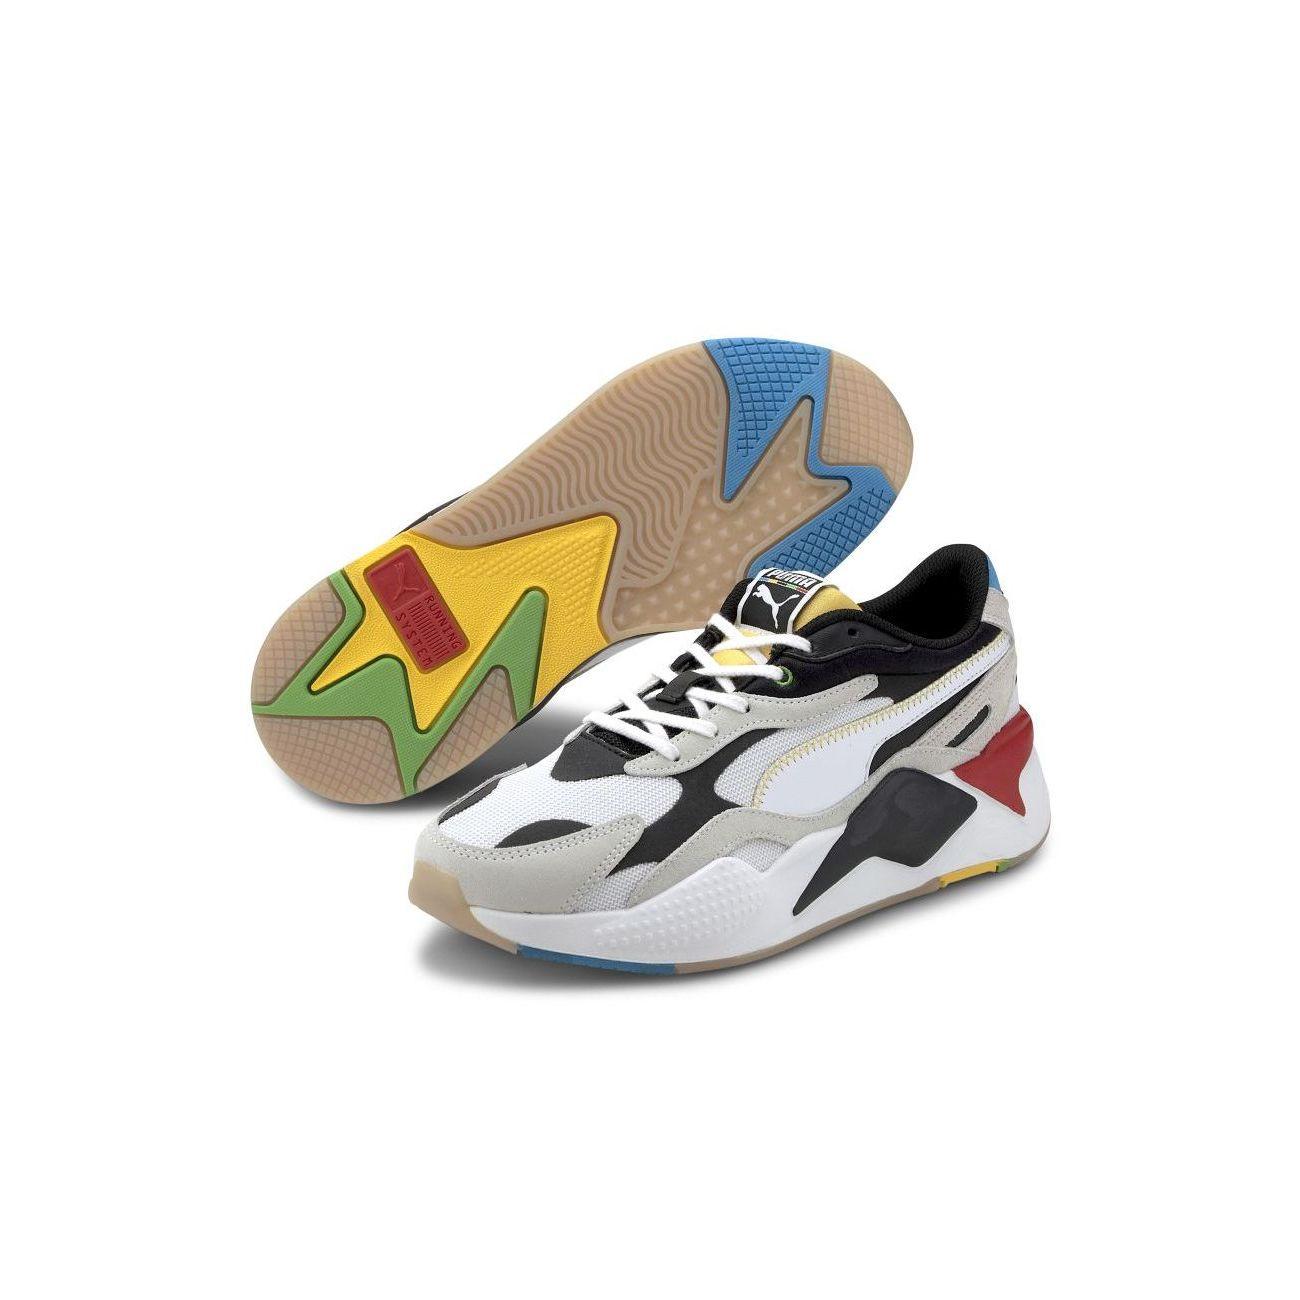 homme PUMA Basket Puma Rs-x3 Wh